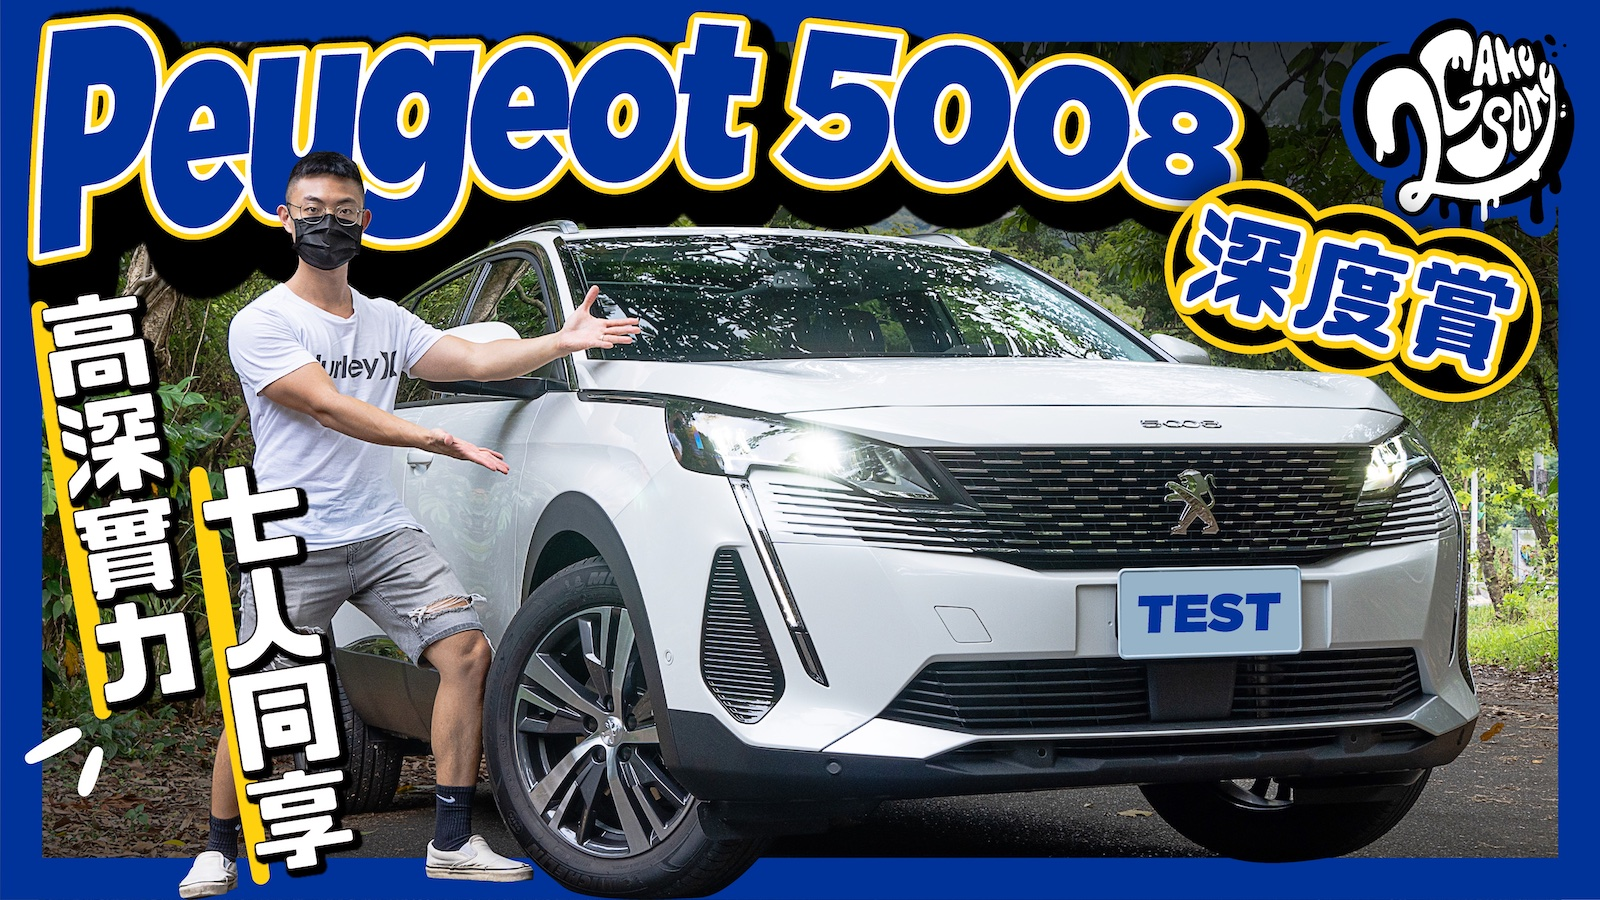 ▲ Peugeot 5008 深度賞|高深實力,七人同享!